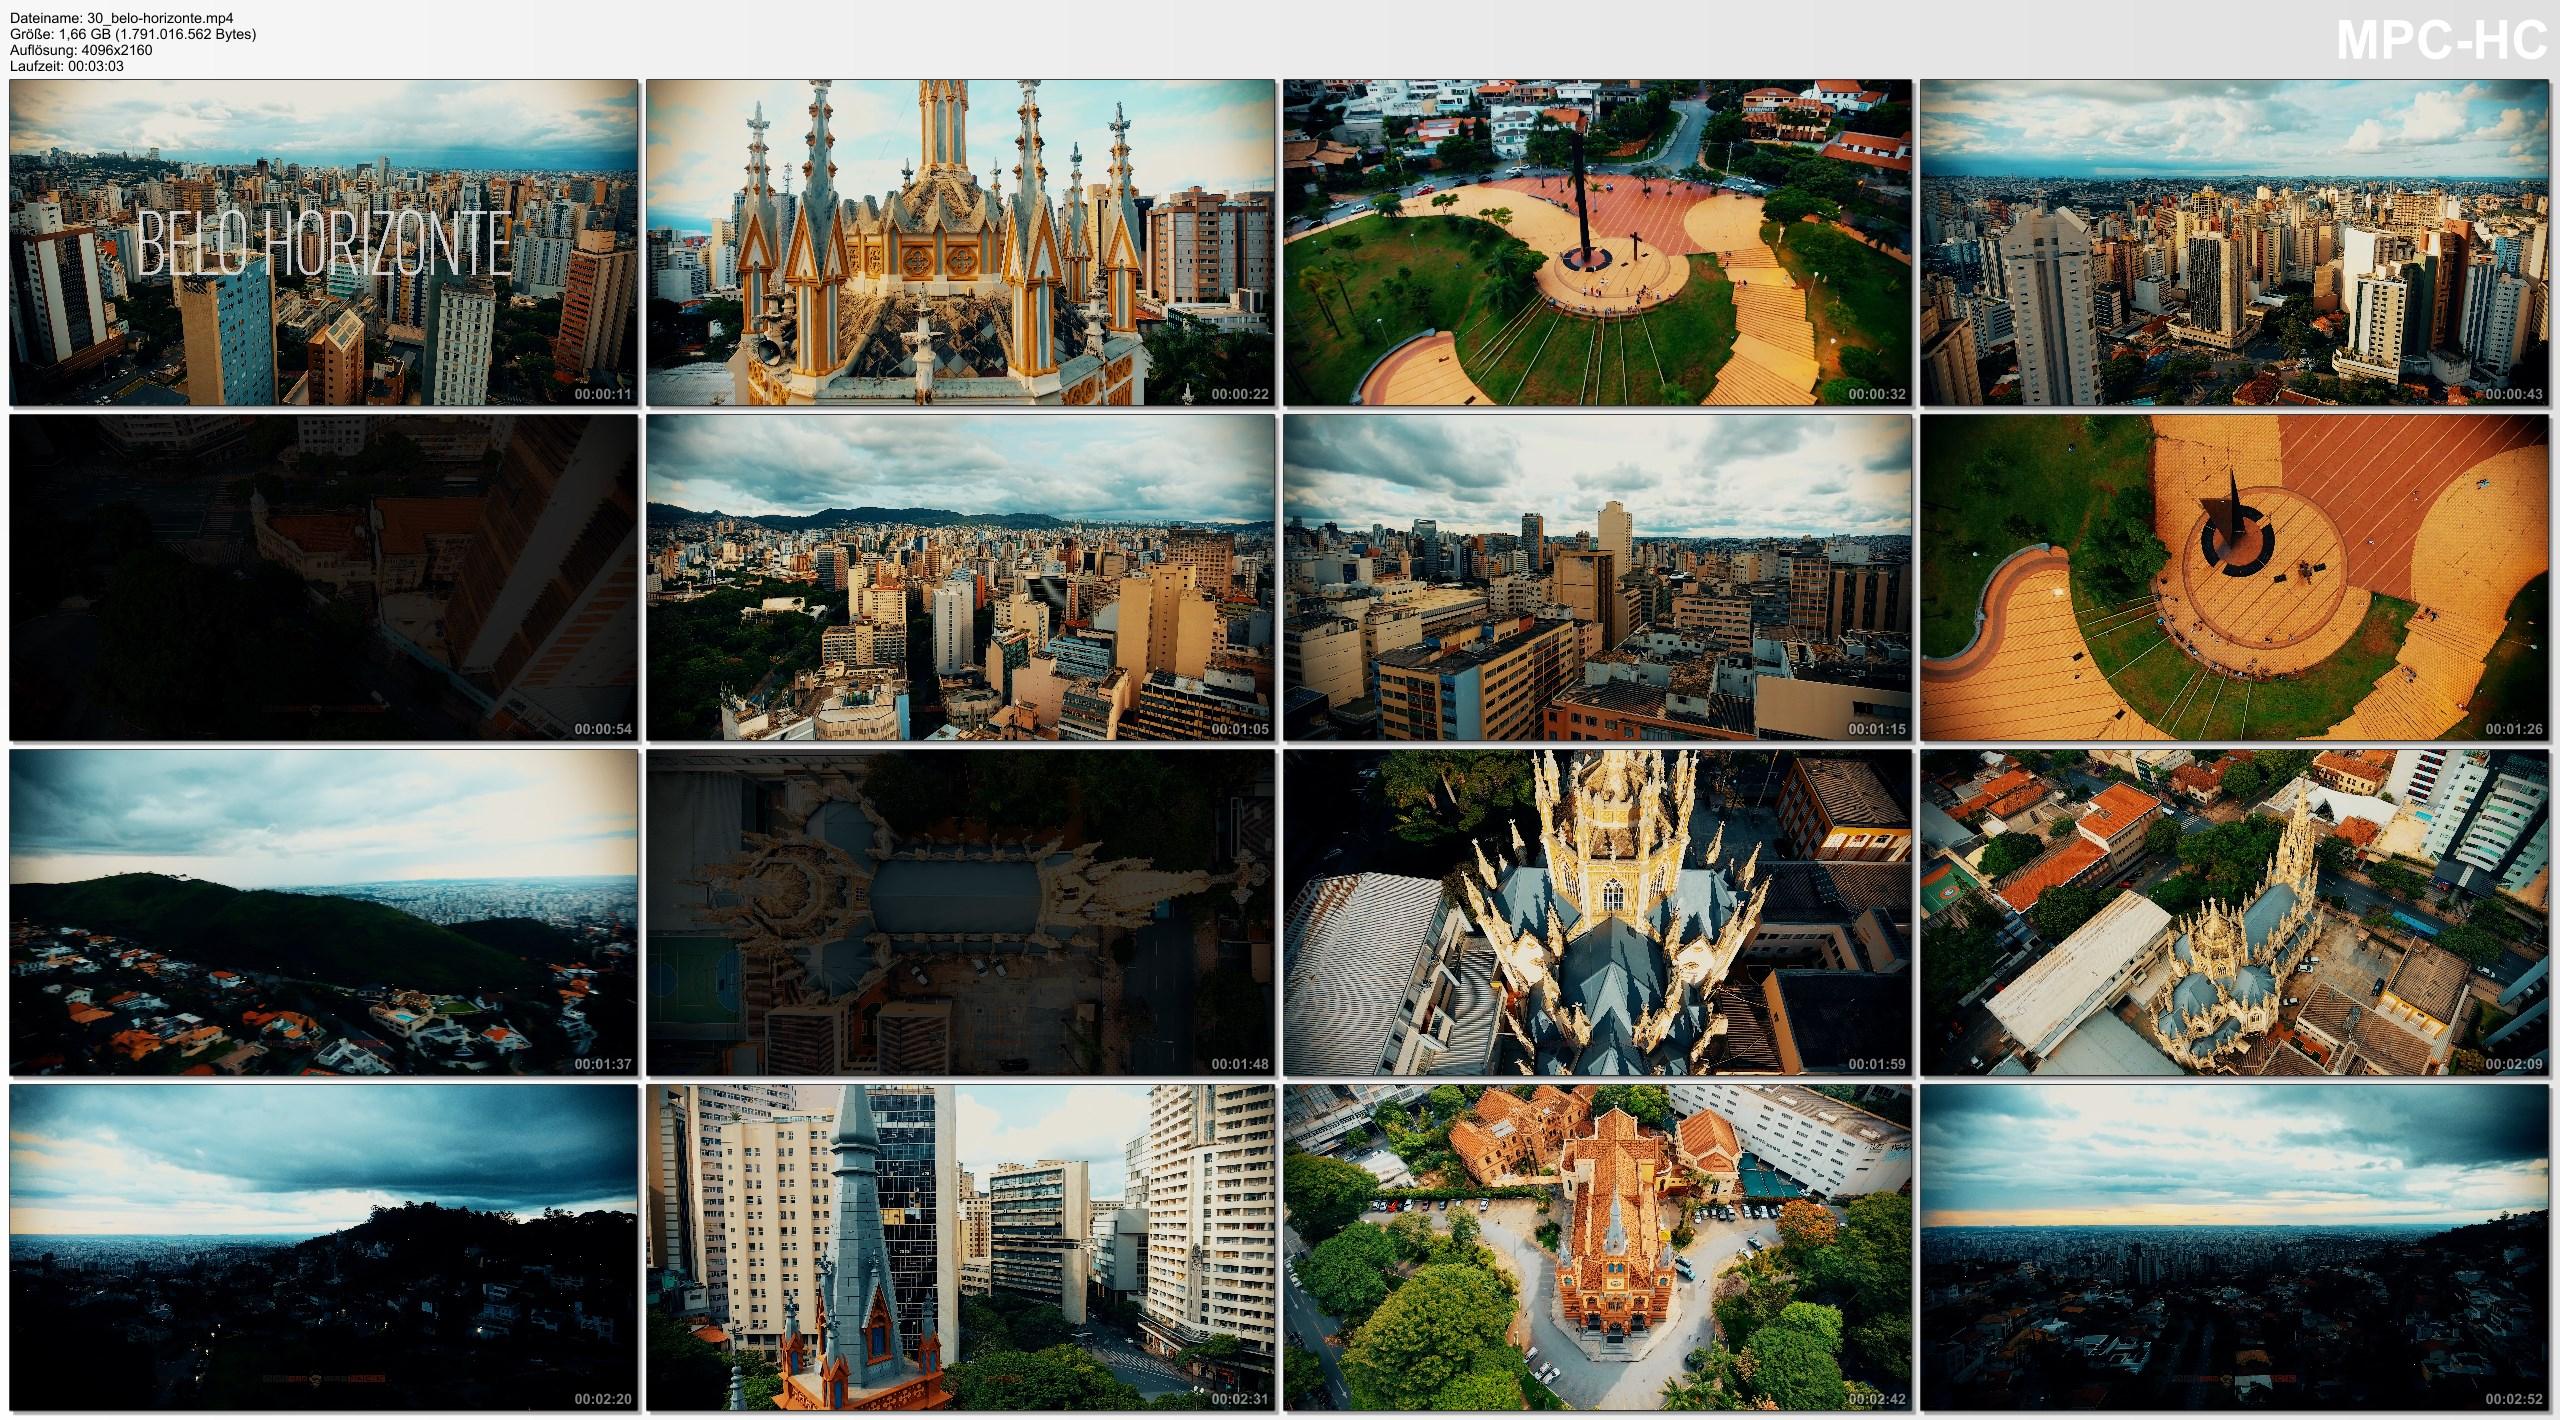 Drone Pictures from Video 4K Drone Footage BELO-HORIZONTE [DJI Phantom 4]